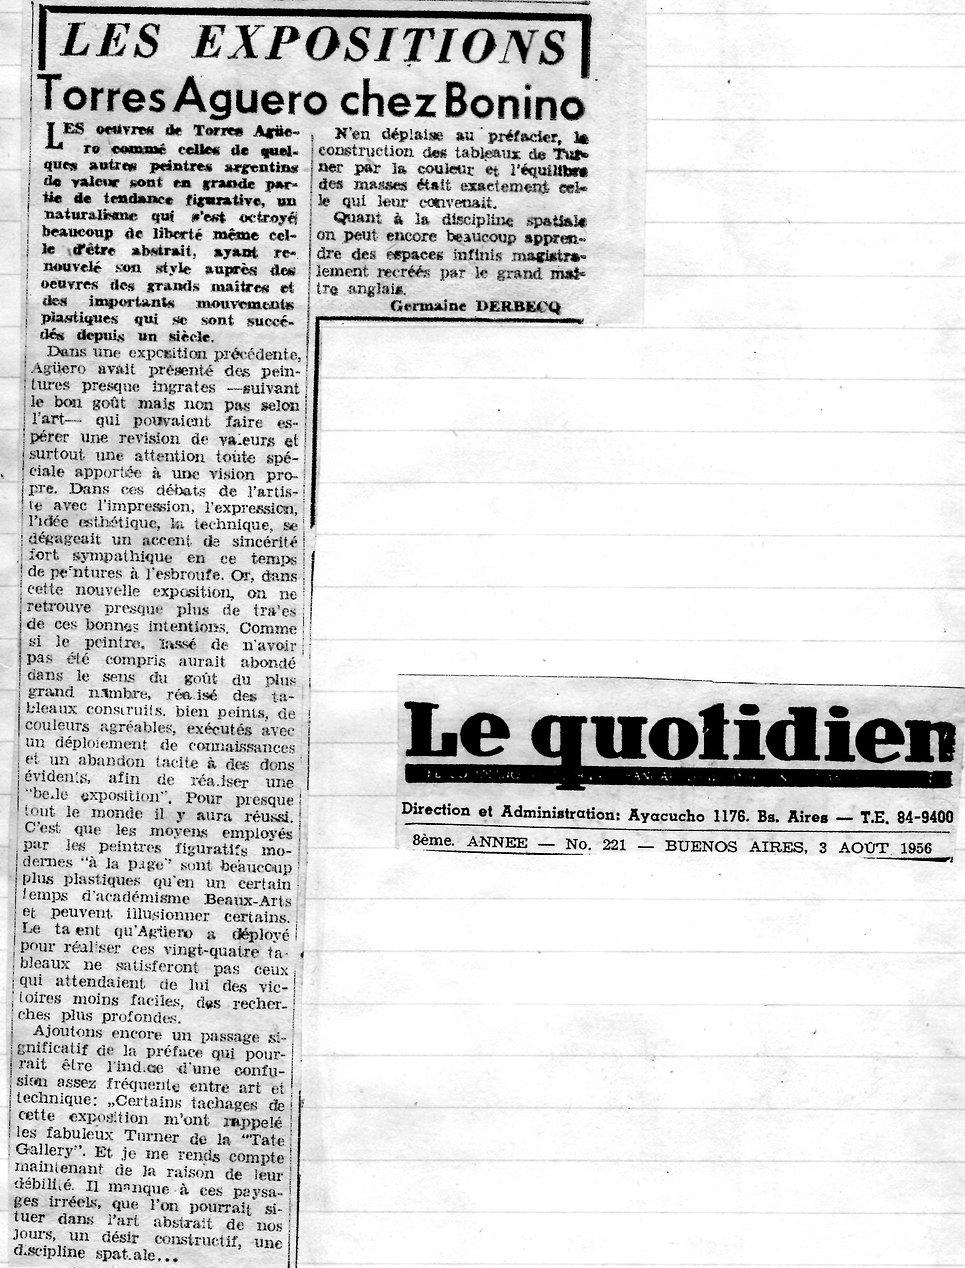 Le Quotidien (Torres Aguero Chez Bonino)